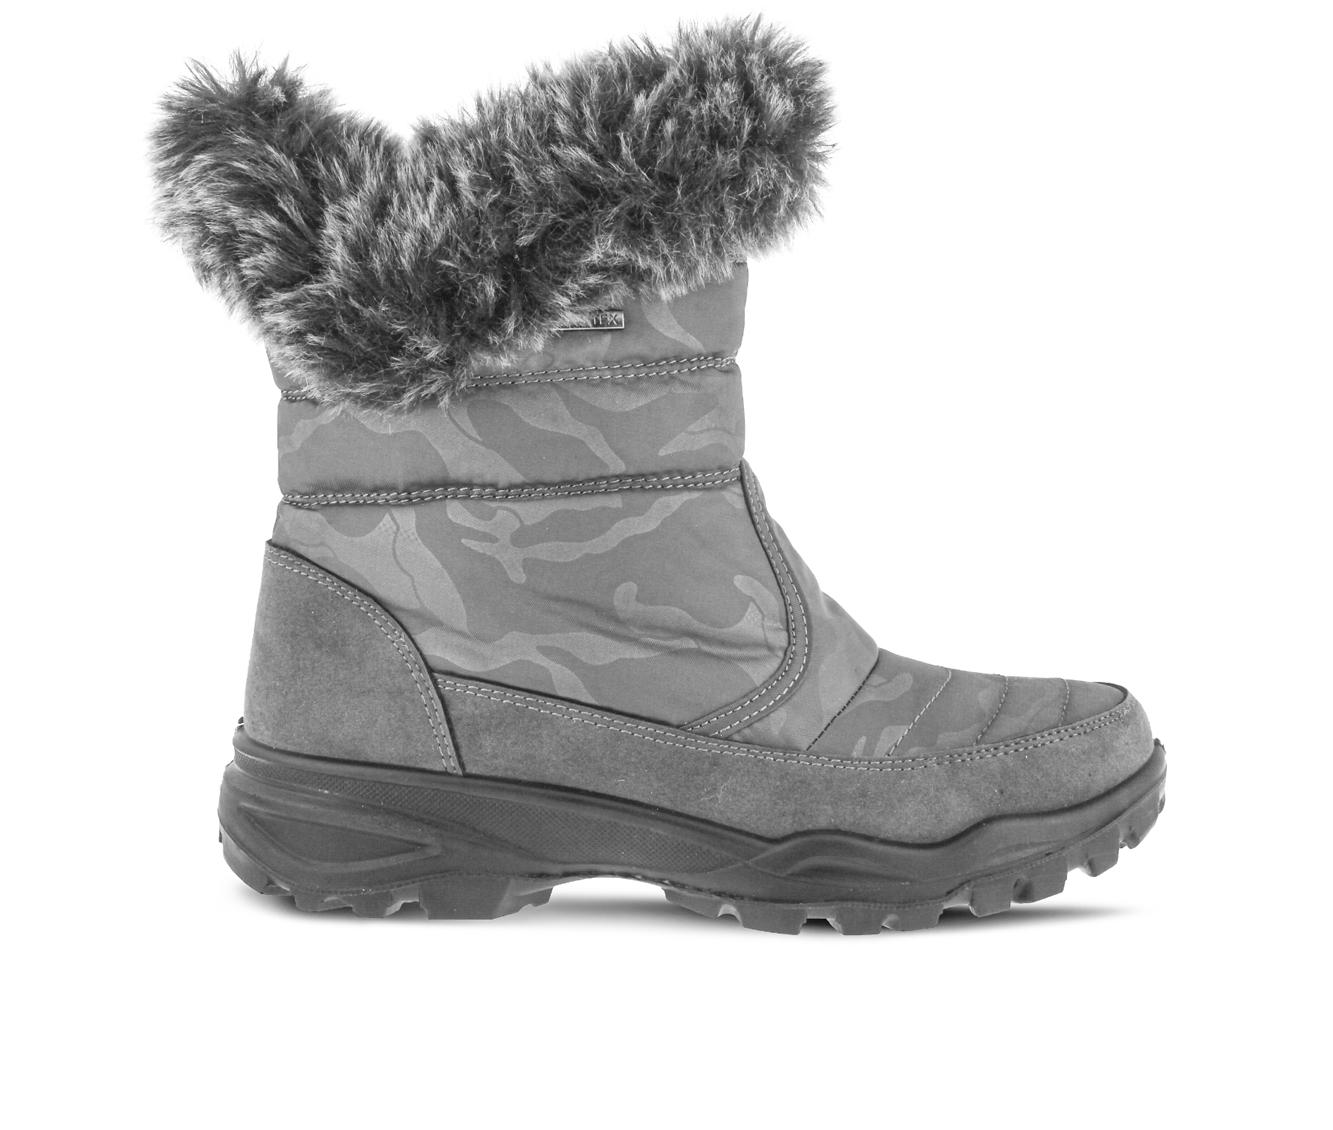 Flexus Korine Women's Boots (Gray Canvas)